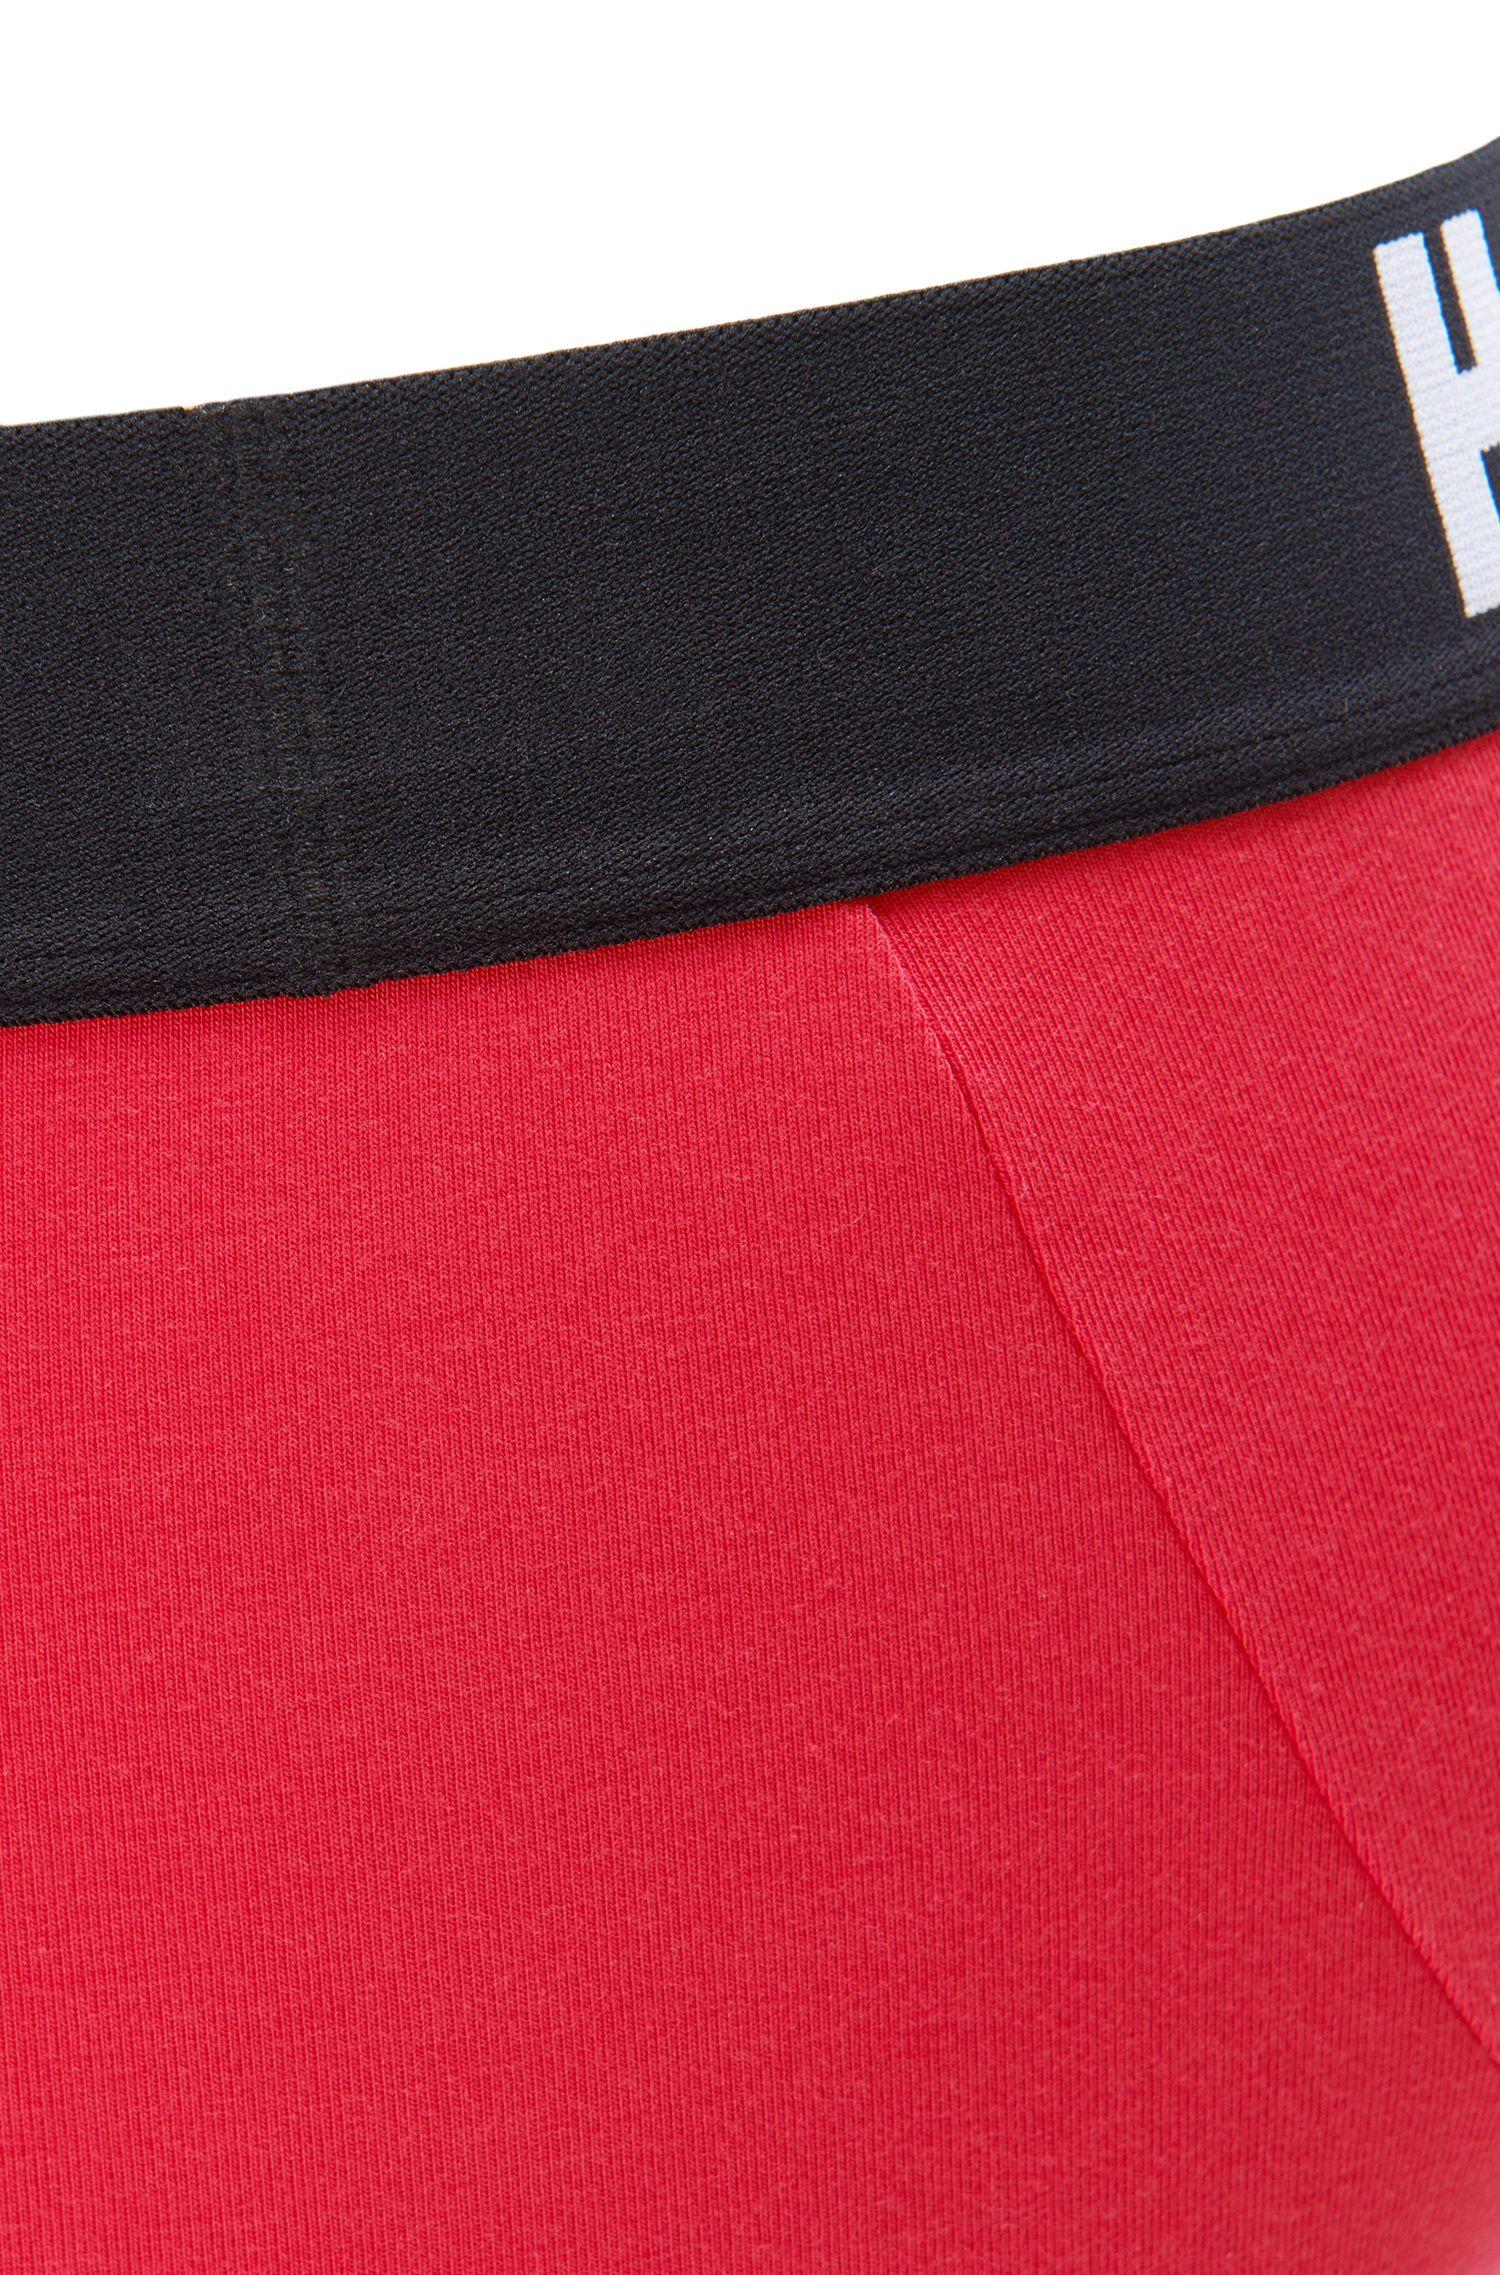 Stretch Cotton Modal Logo Trunk | Trunk Signature, Pink